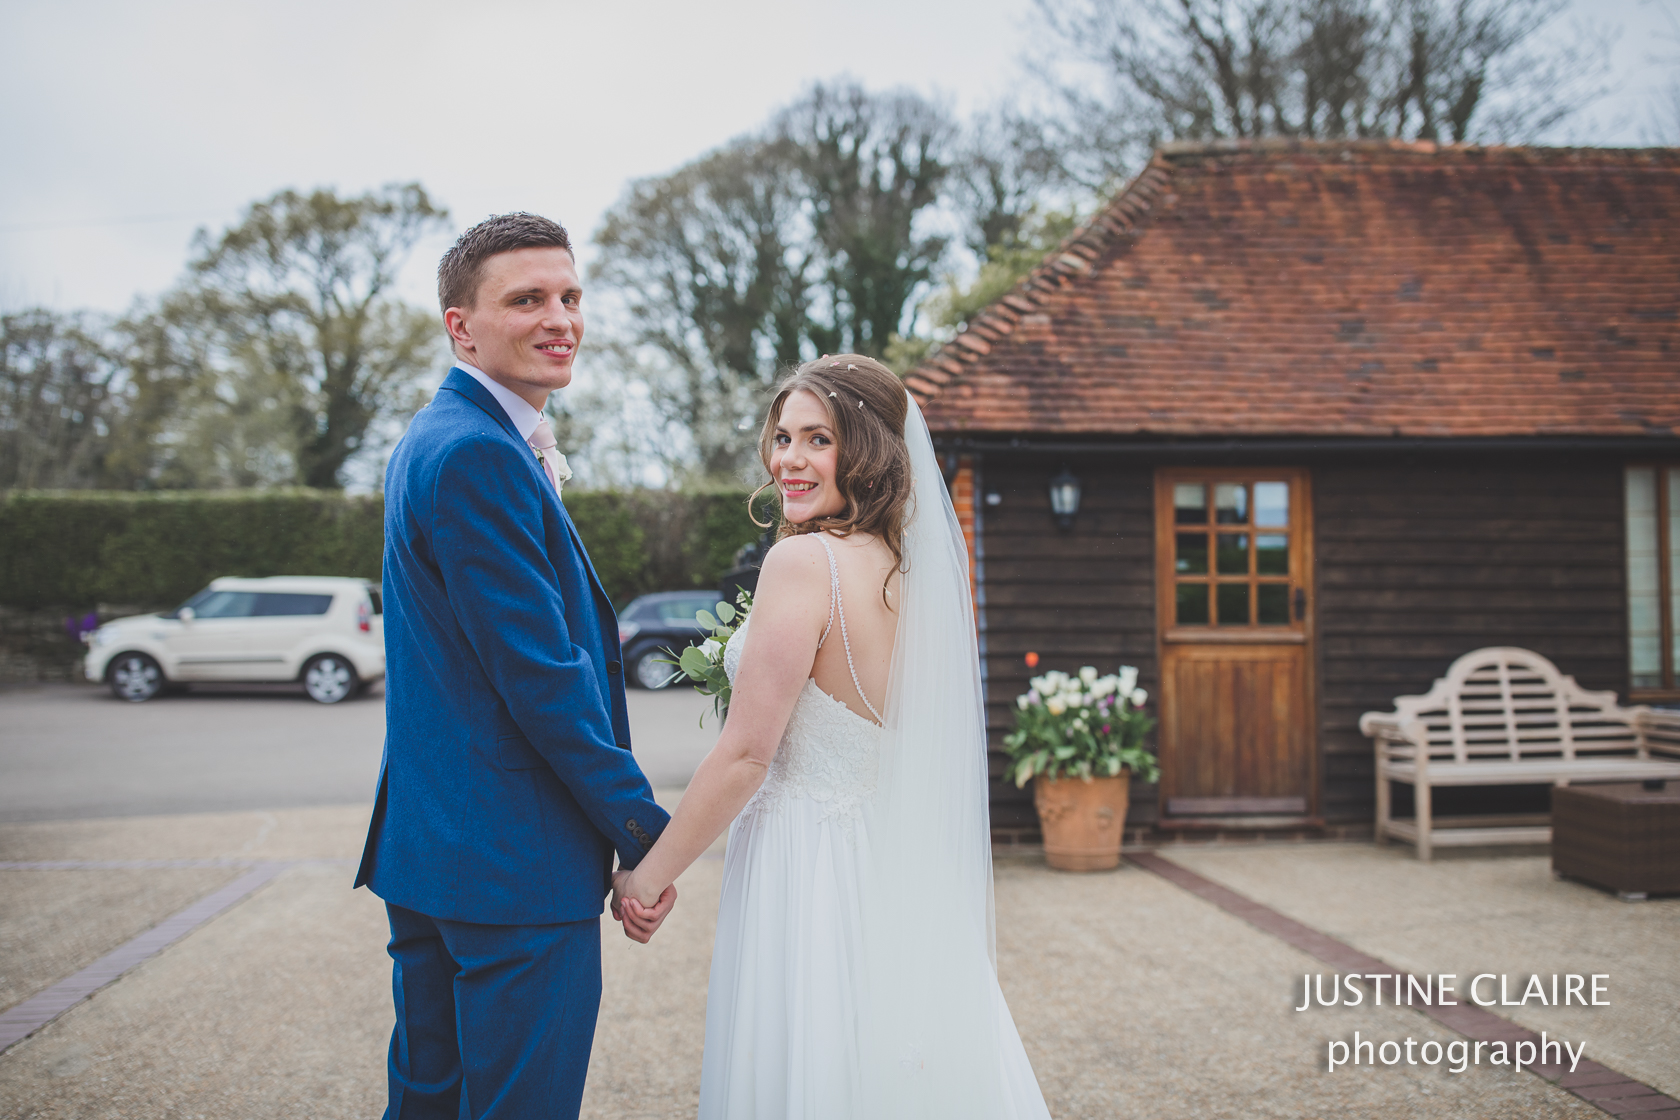 Fitzleroi Fittleworth petworth Billingshurst farm Wedding Photography by Justine Claire photographer Arundel Worthing Brighton-25.jpg